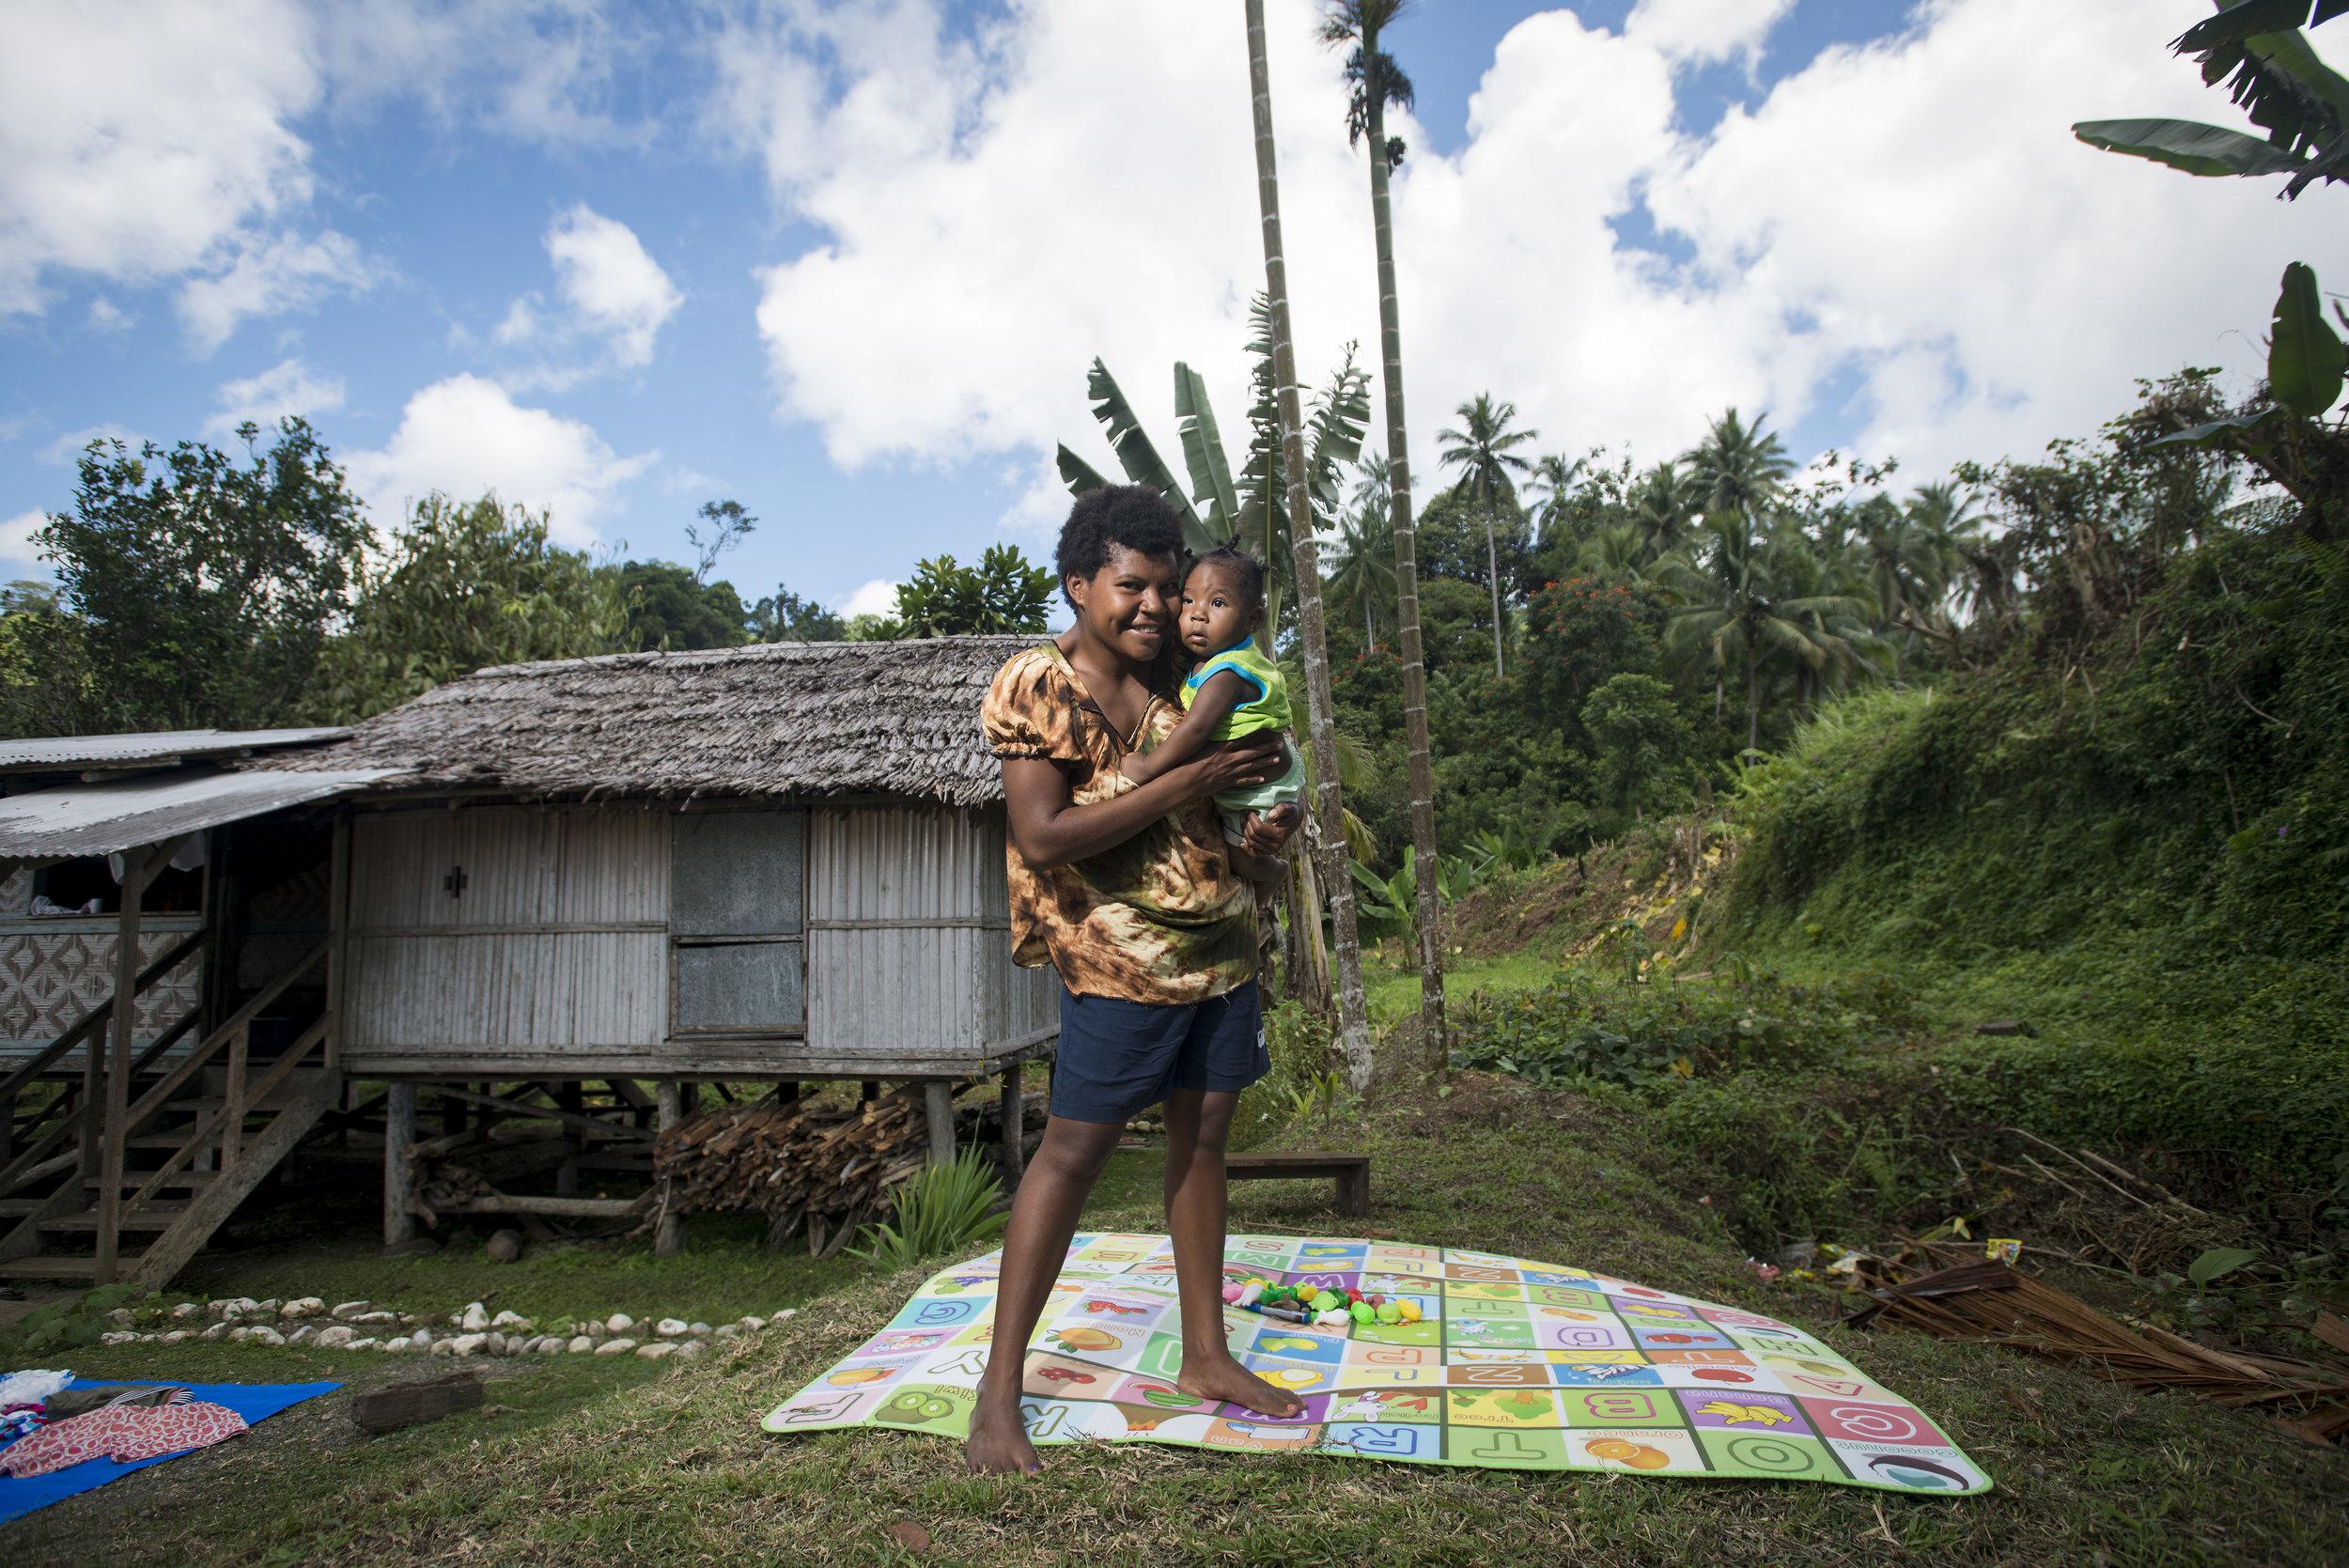 Birthing Kit project. East Sepik, PNG. 2018.